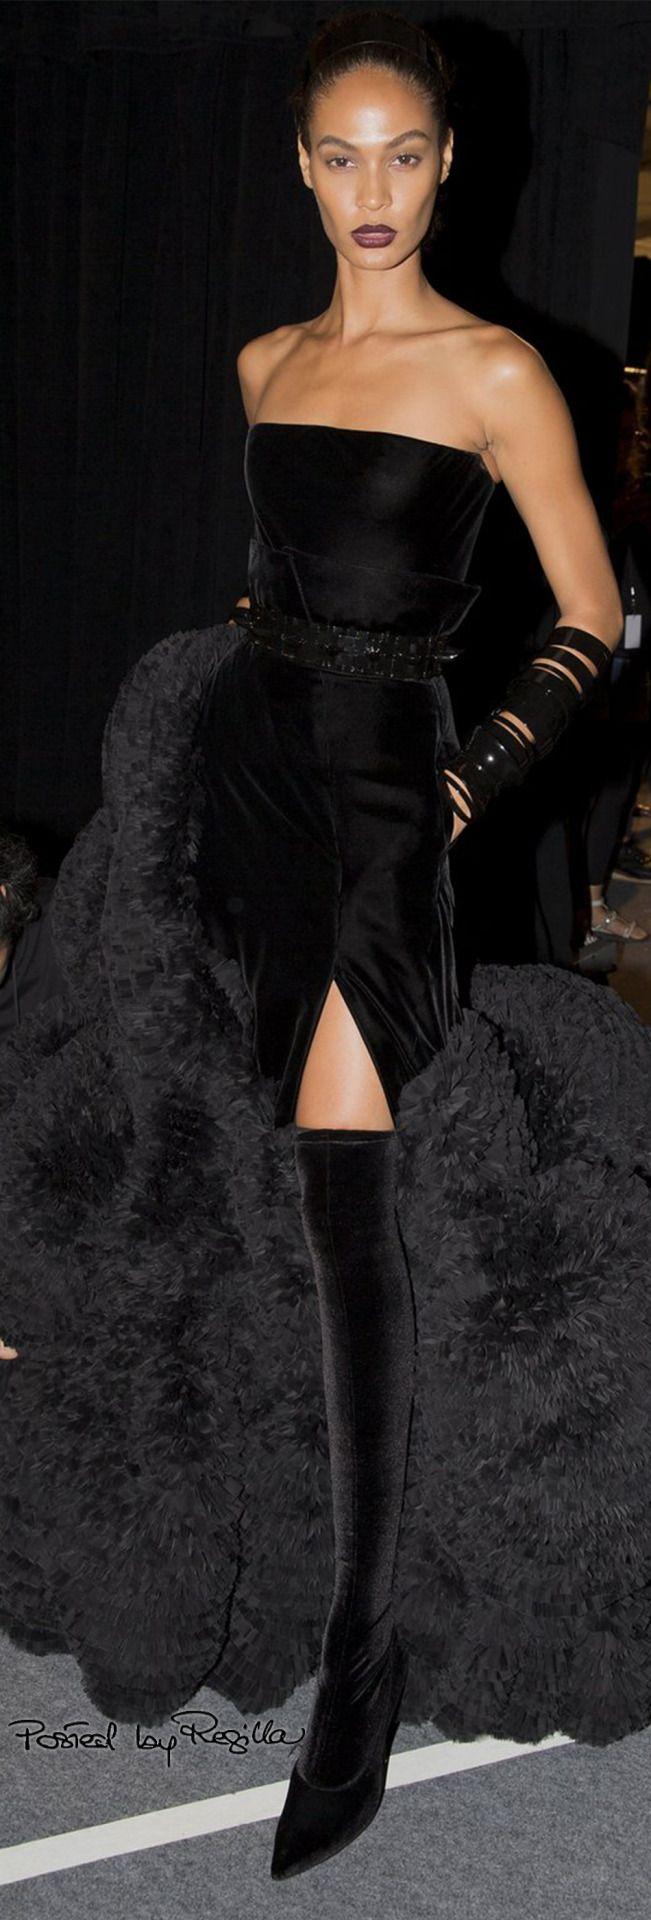 Joan Smalls Rodriguez / Givenchy, Spring 2016 / Regilla ⚜